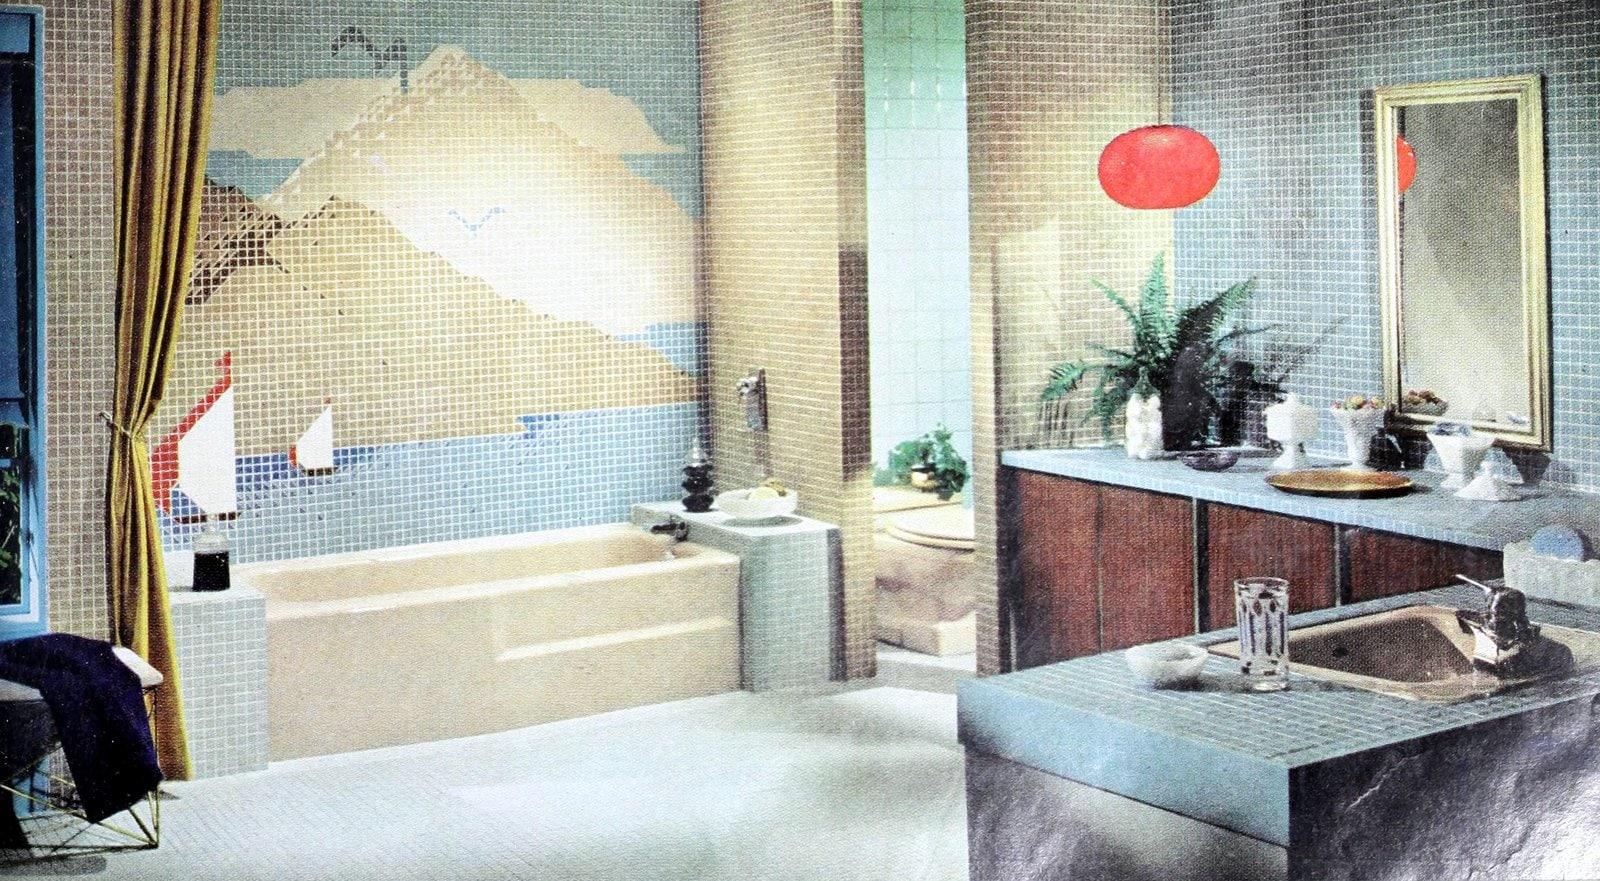 Beautiful large mosaic tile mountain art over bathtub (1965)